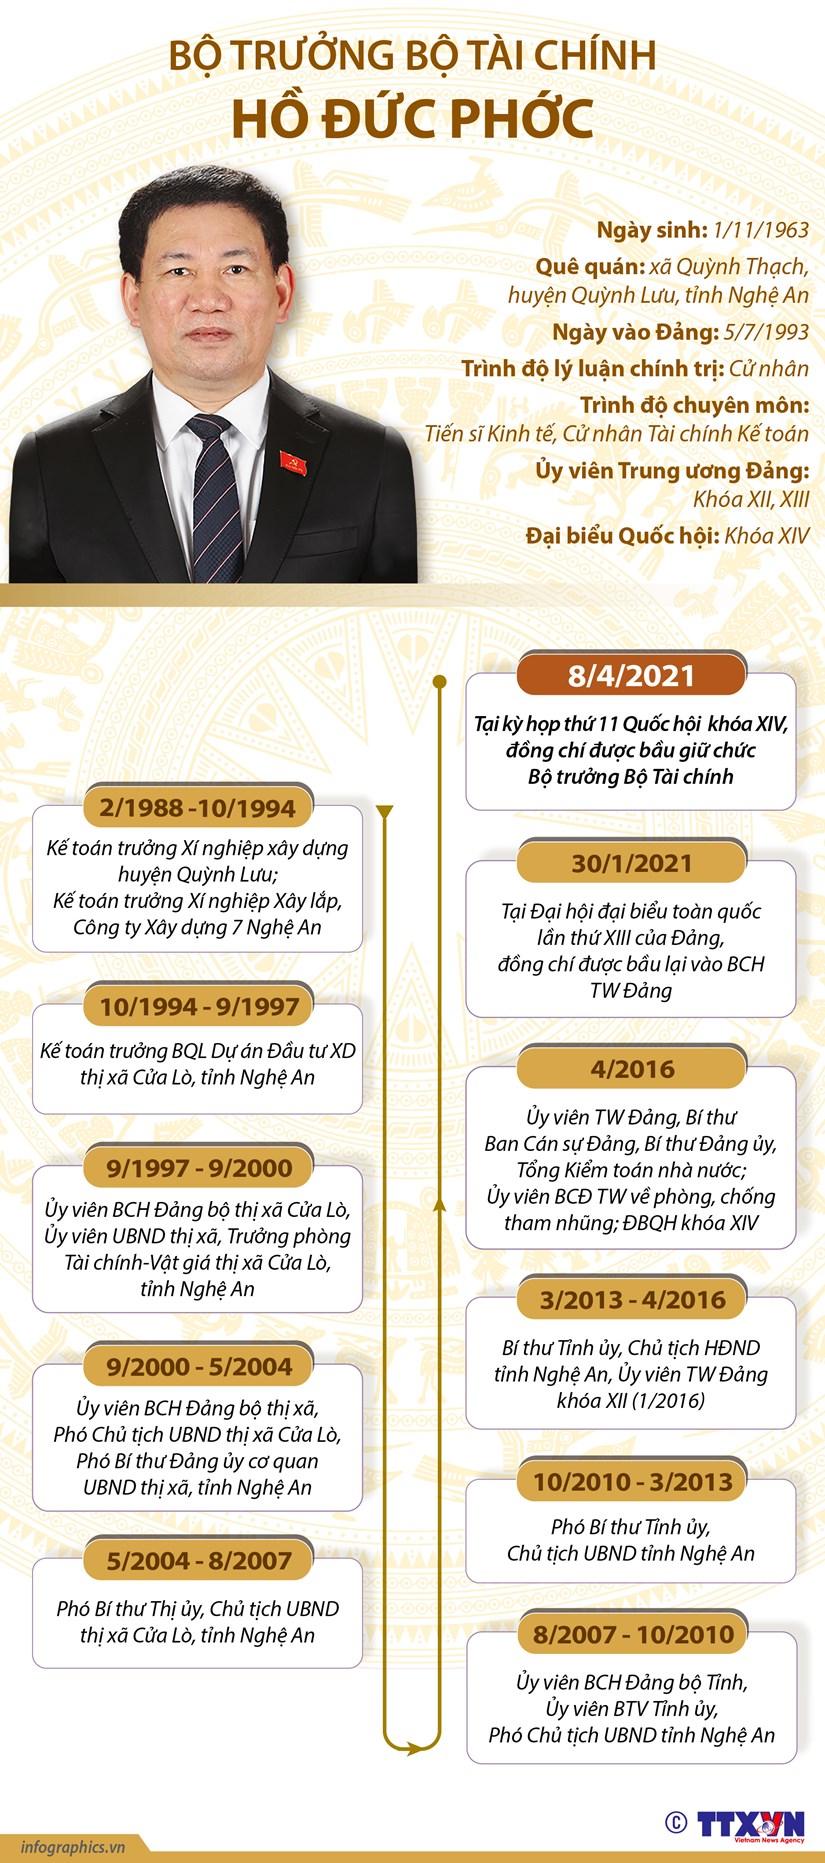 [Infographics] Tieu su tan Bo truong Bo Tai chinh Ho Duc Phoc hinh anh 1